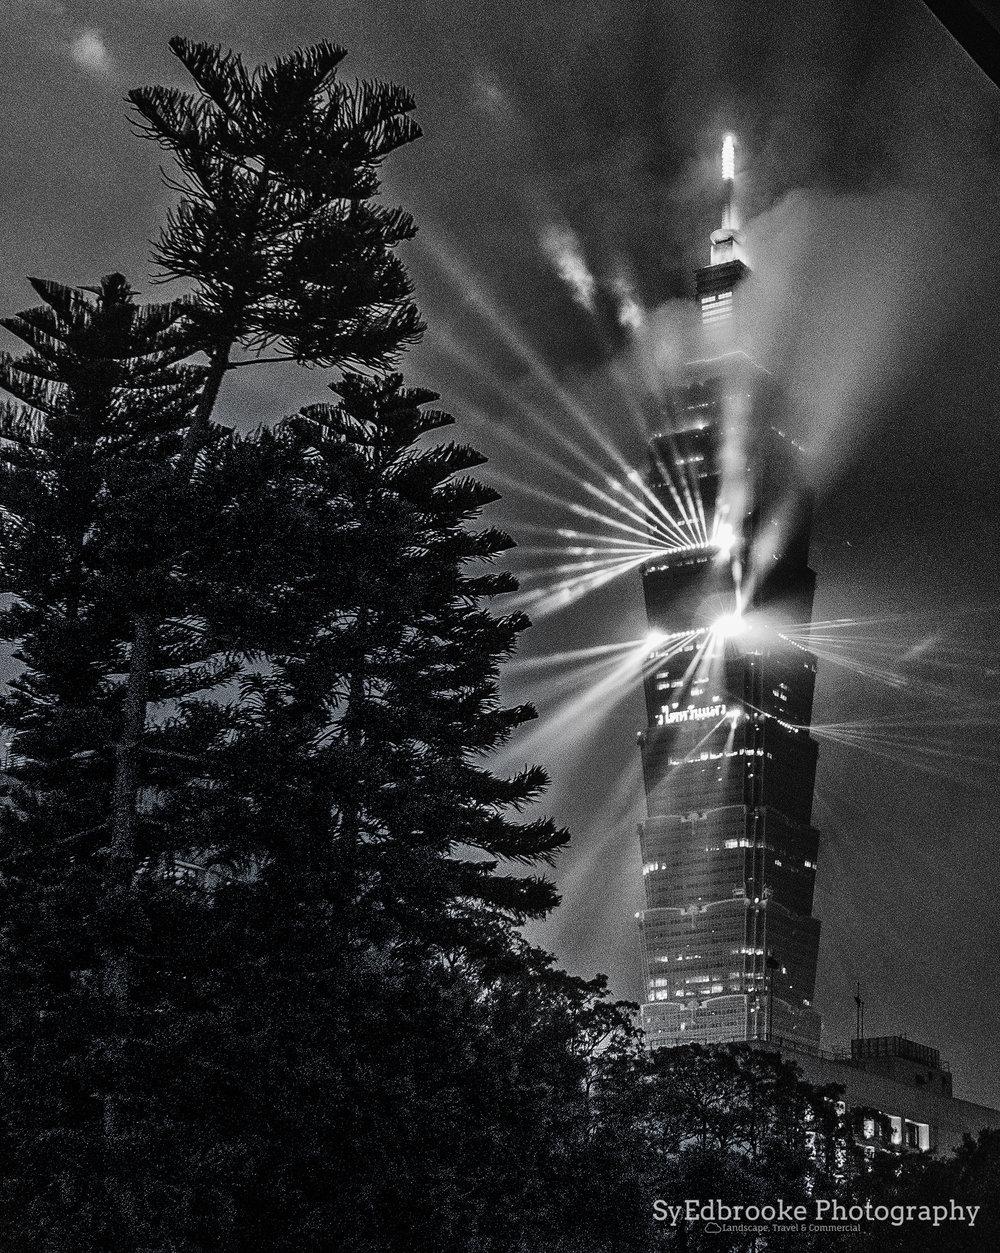 Taipei light show. f1.8, ISO 1600, 1/30, 35mm